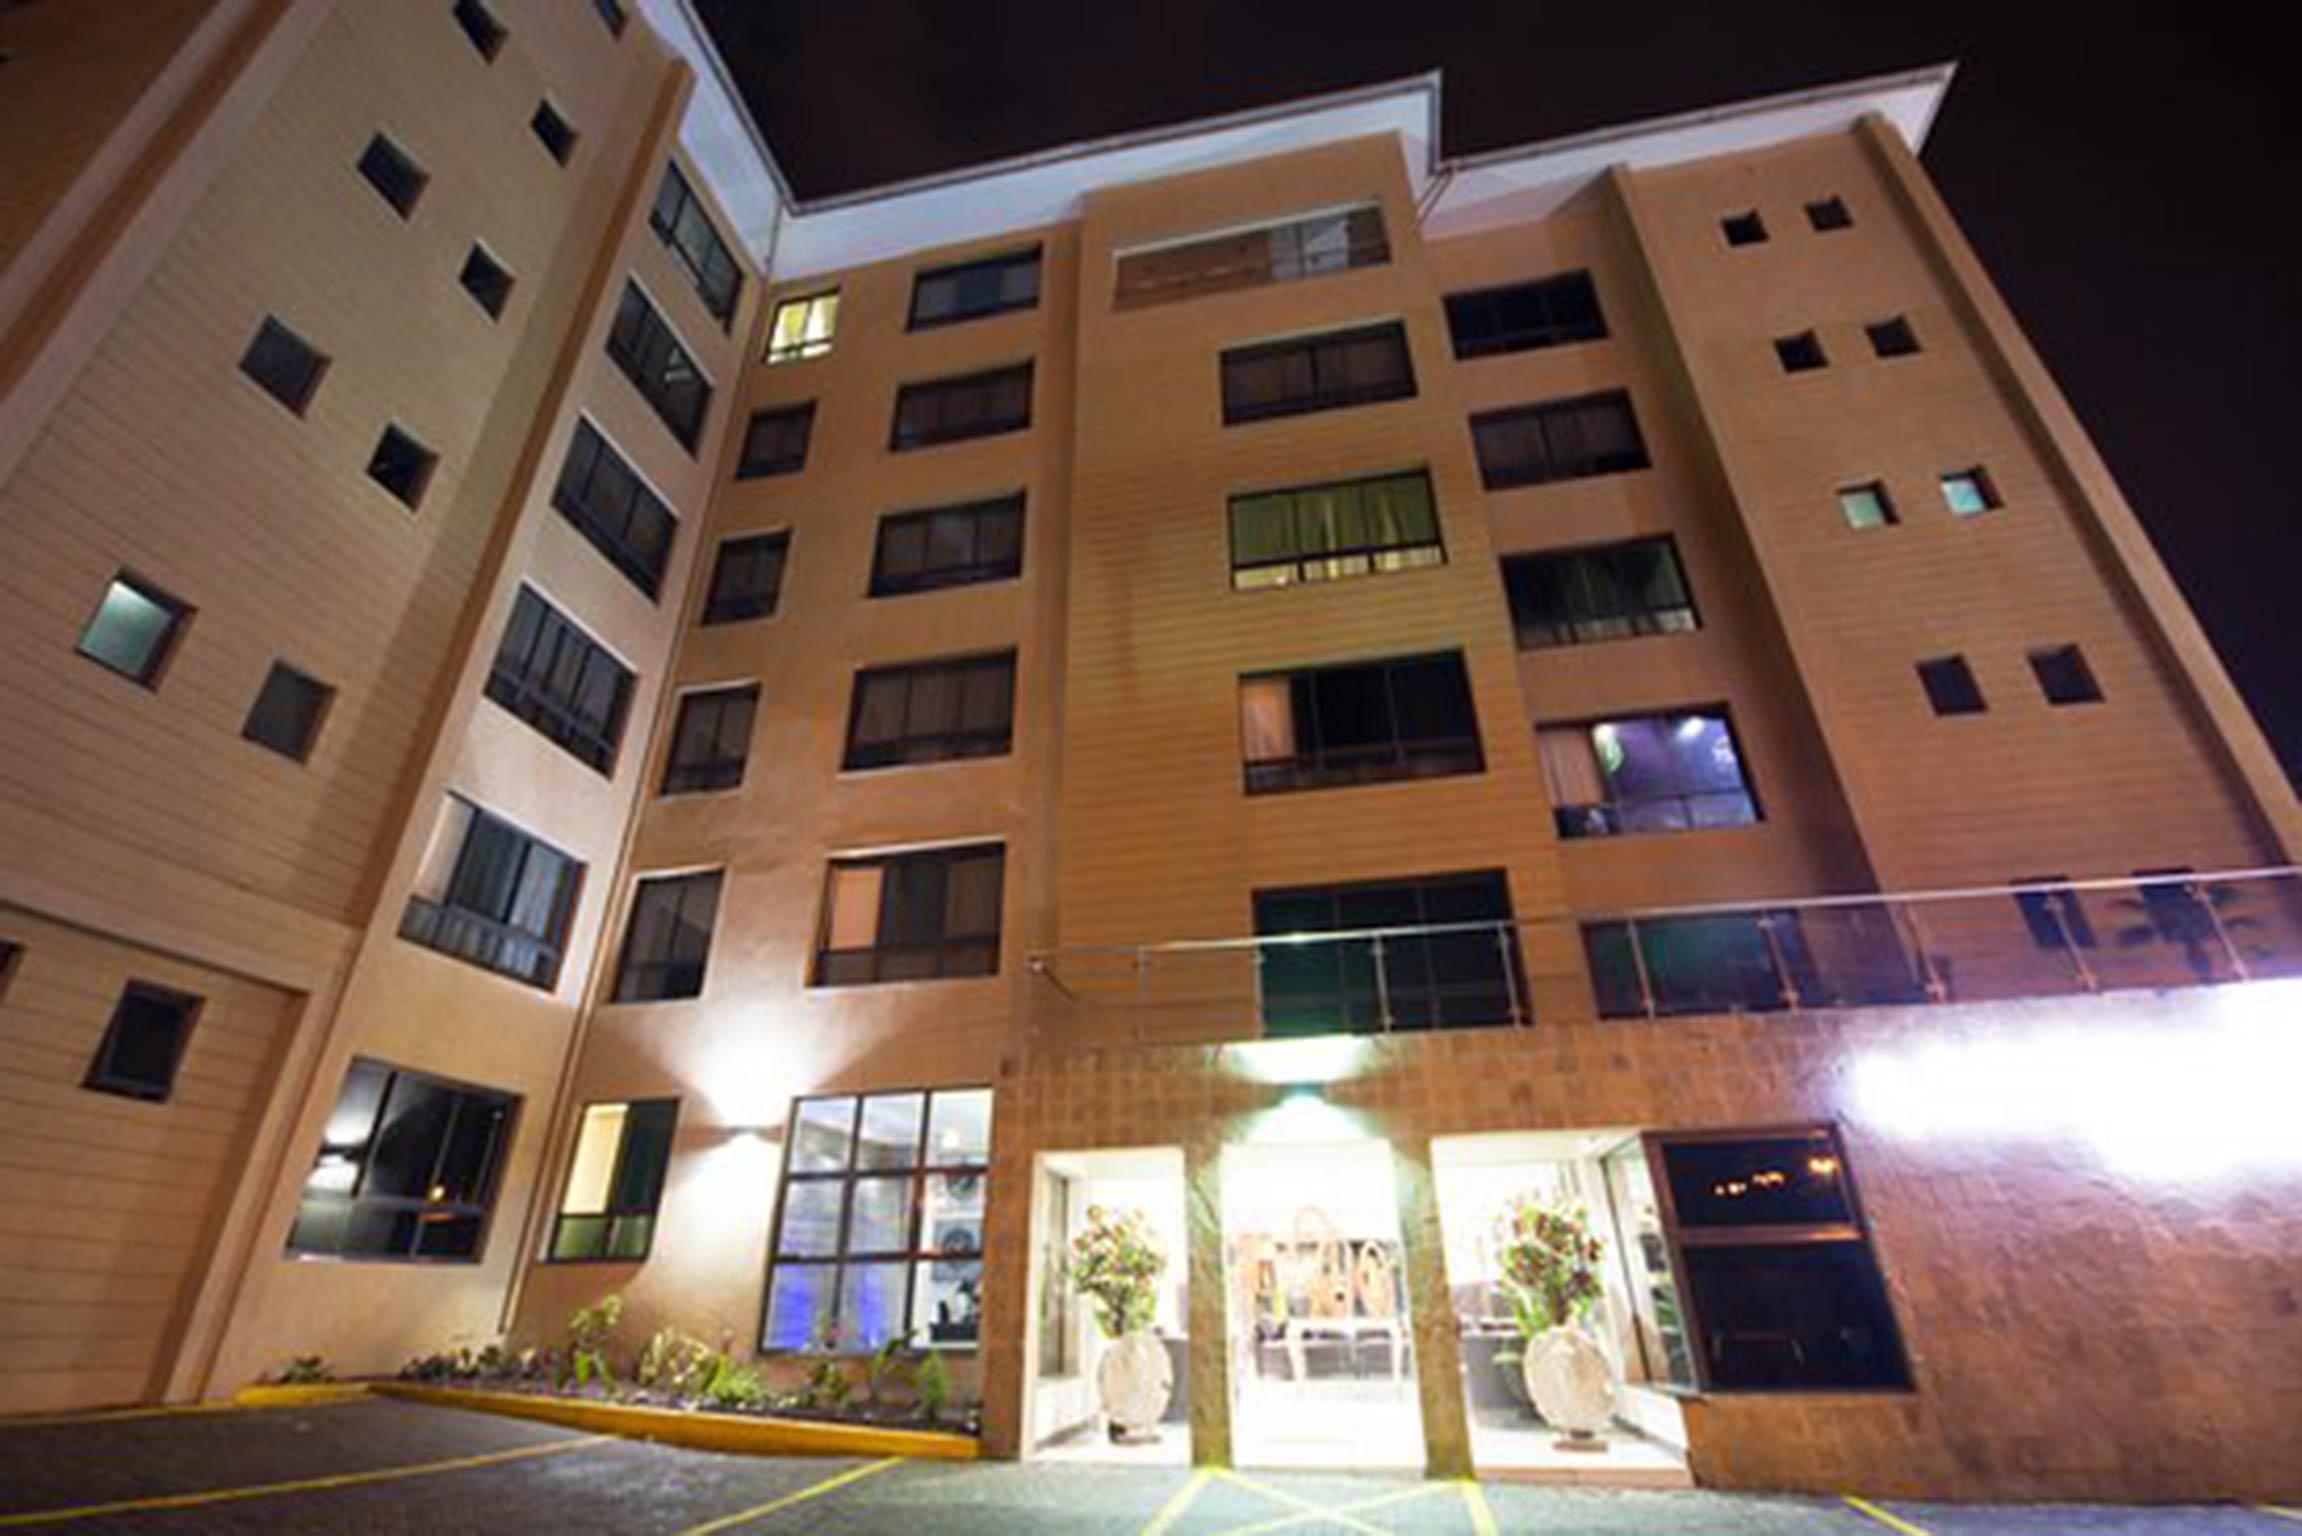 Wundervolles Penthouse mit 3 Schlafzimmern im Lankmark Suite Hotel